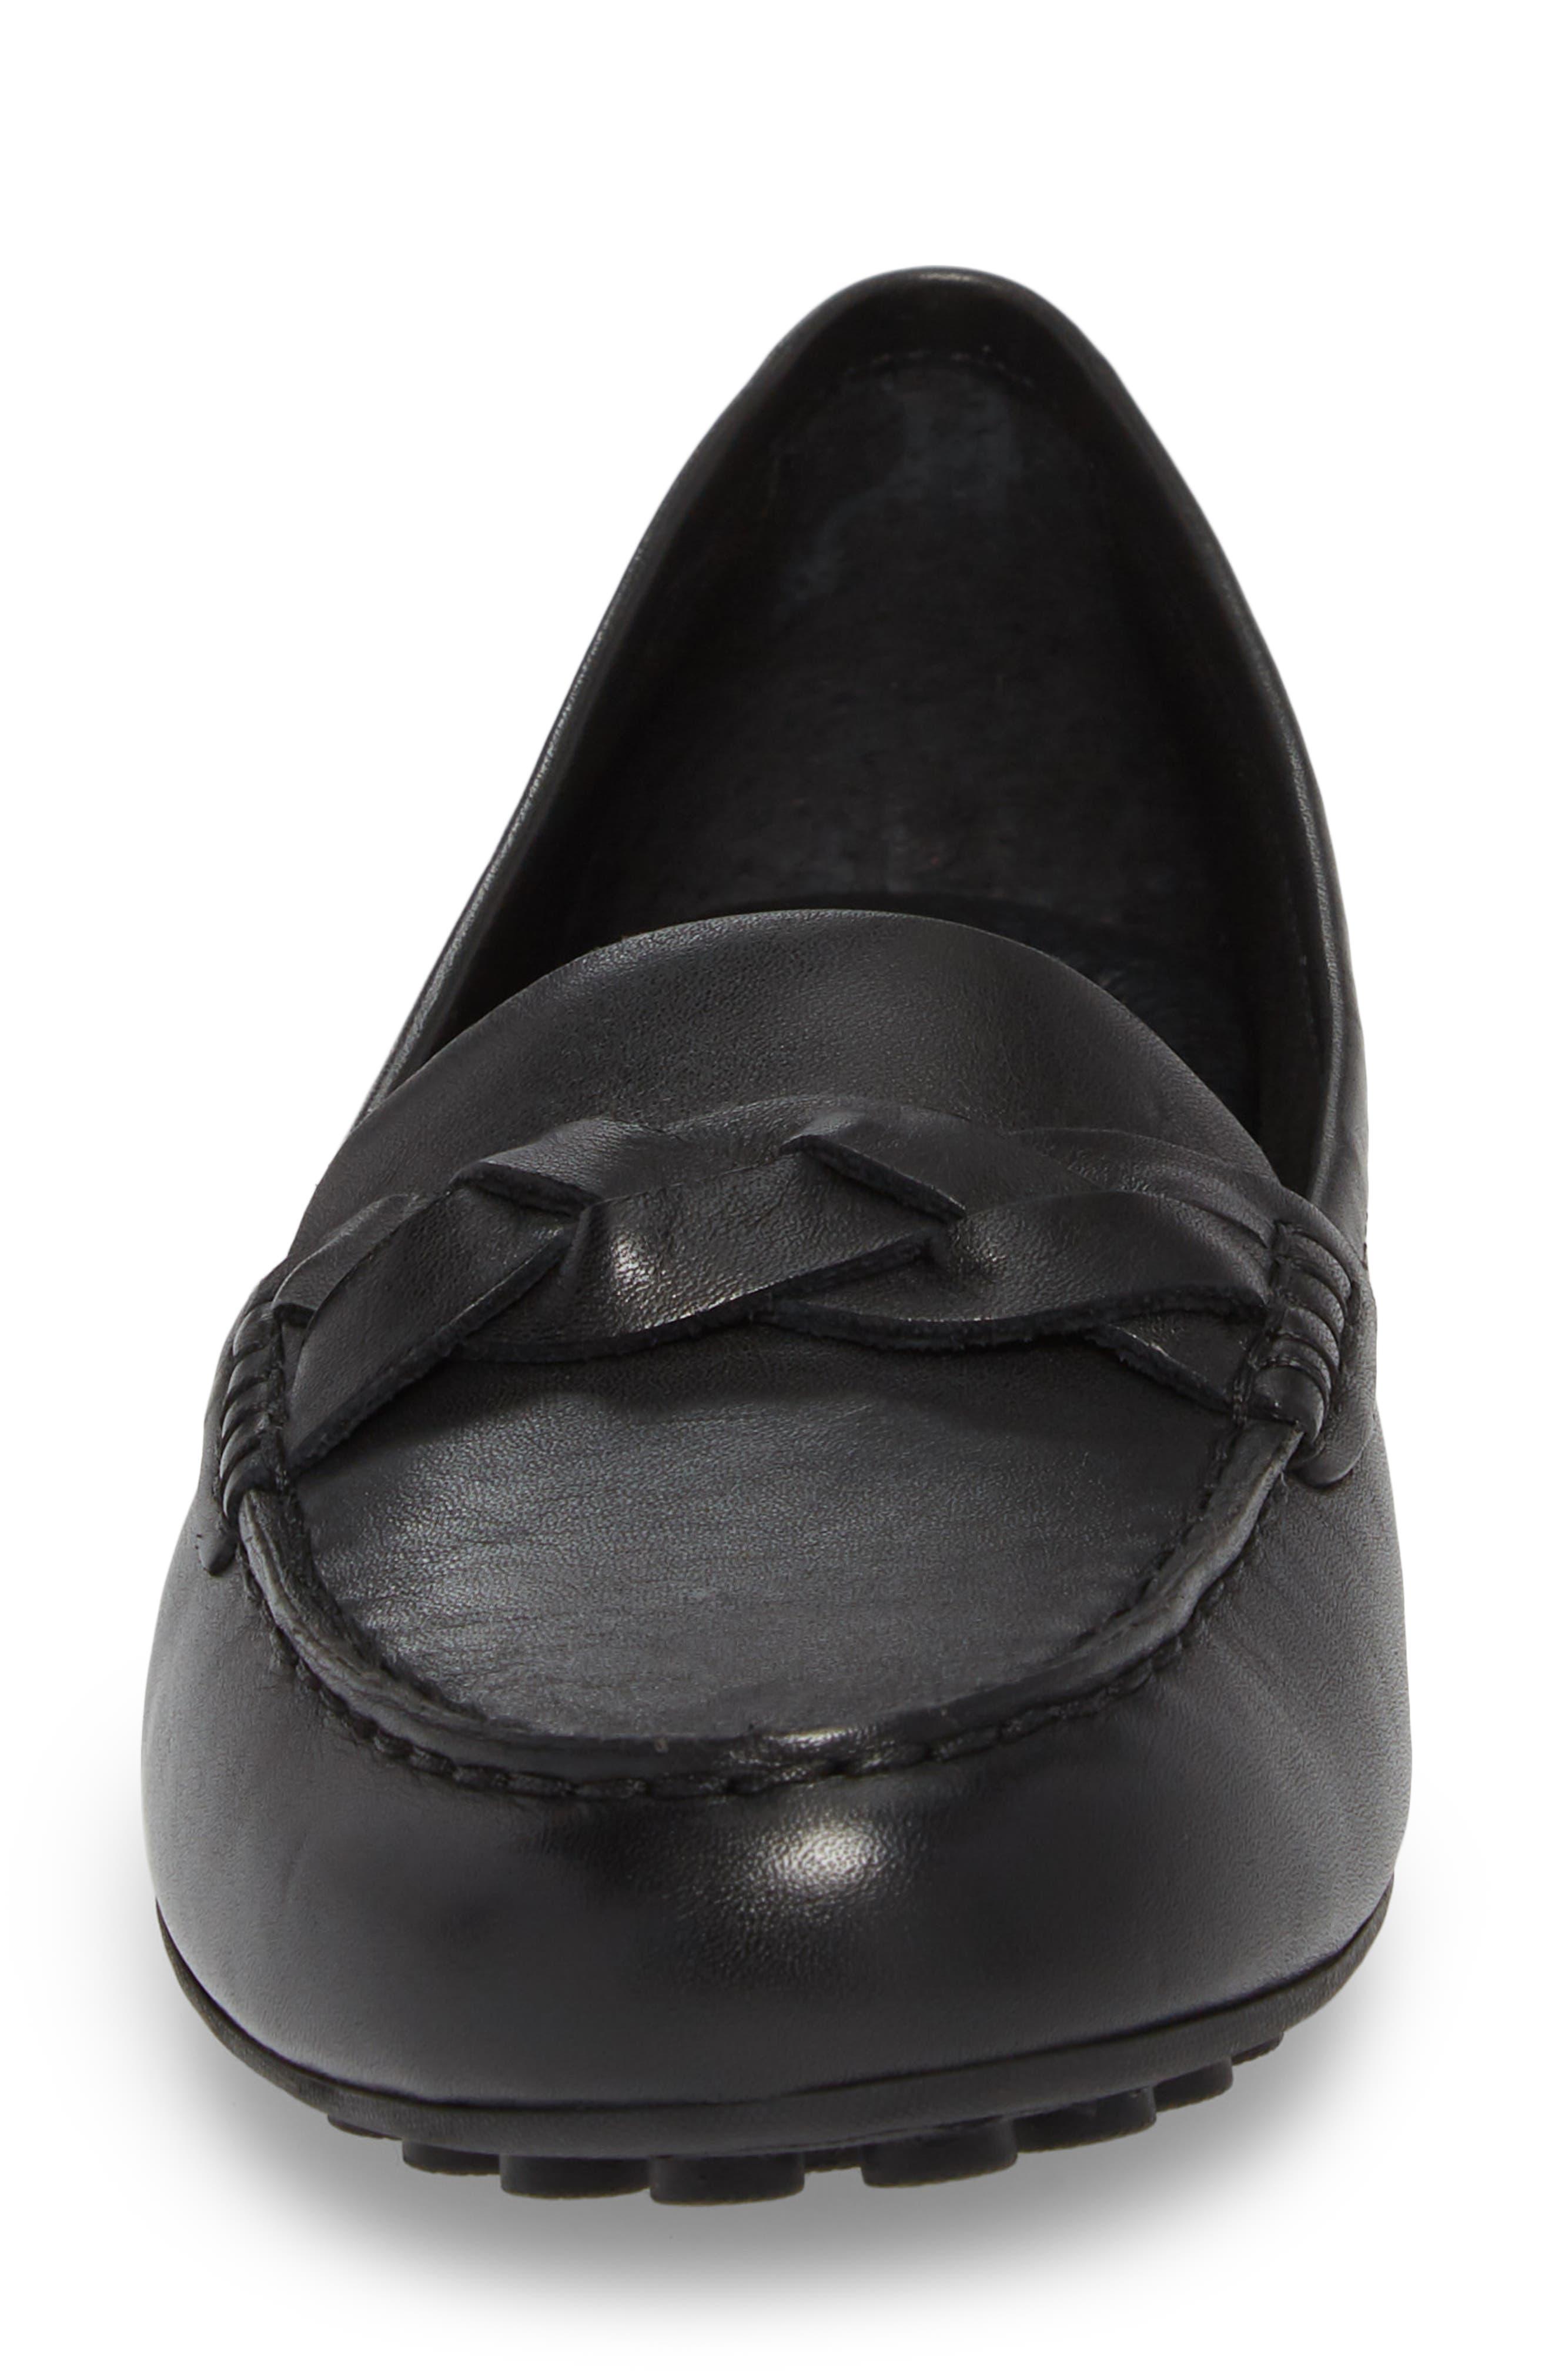 Kasa Loafer,                             Alternate thumbnail 4, color,                             Black Leather